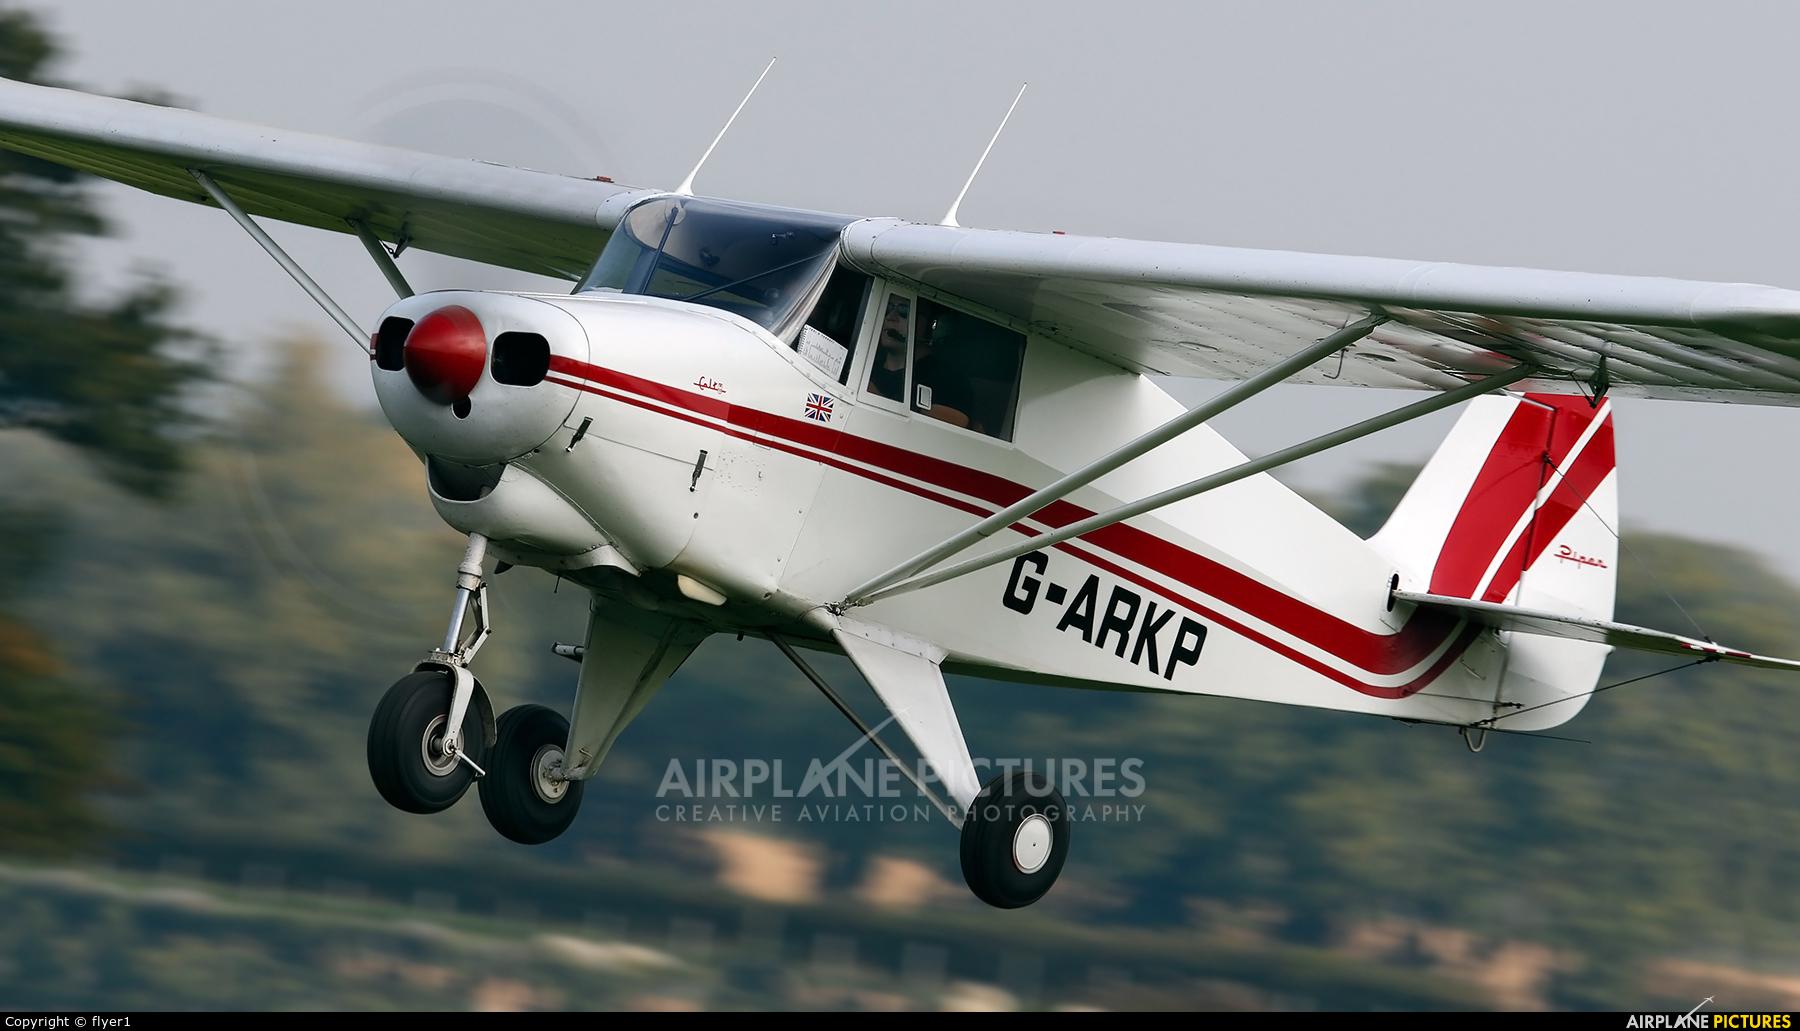 Private G-ARKP aircraft at Lashenden / Headcorn